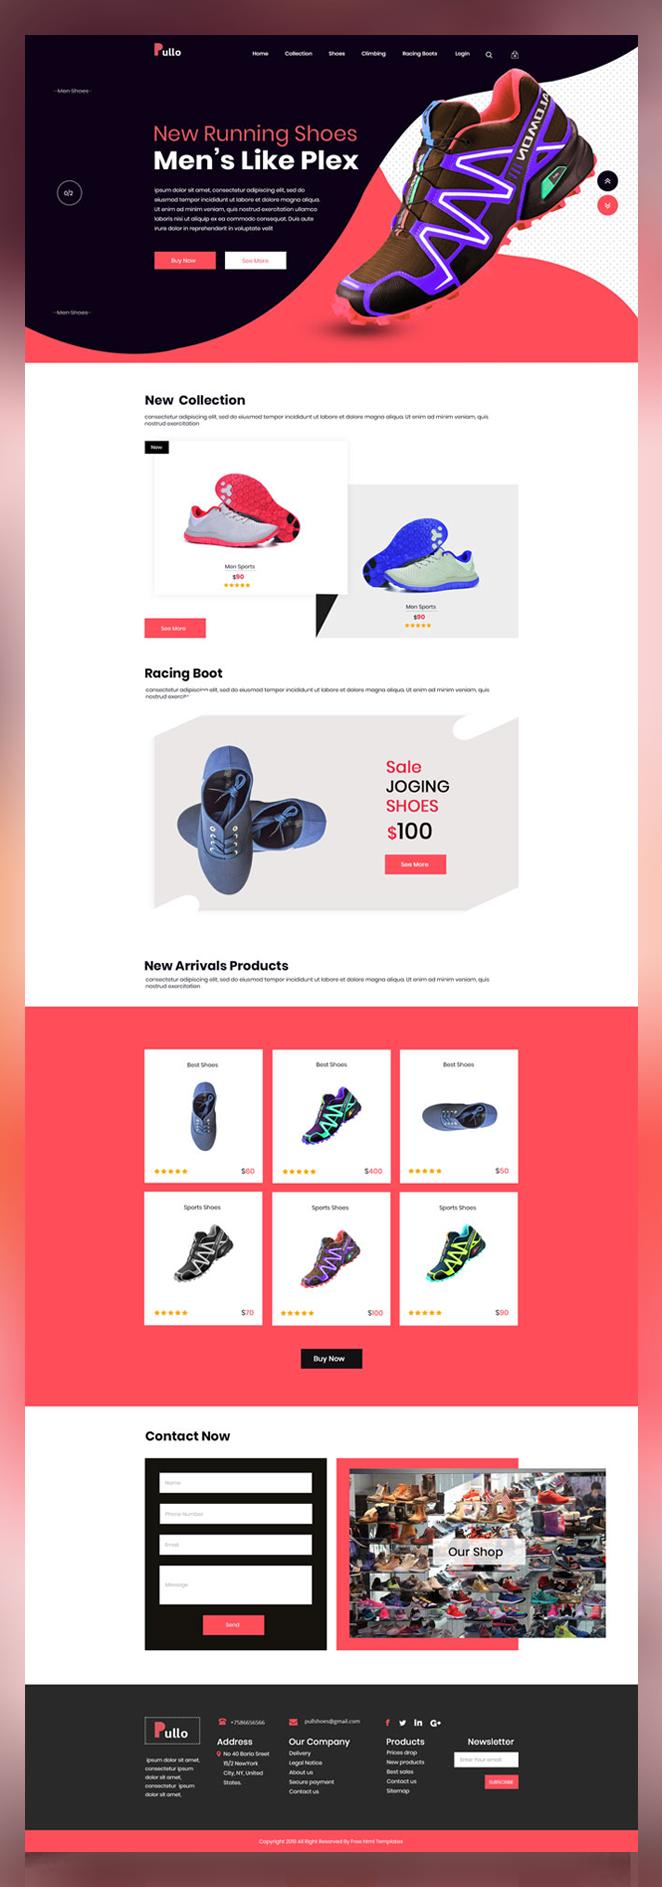 Pullo shoes shop psd template